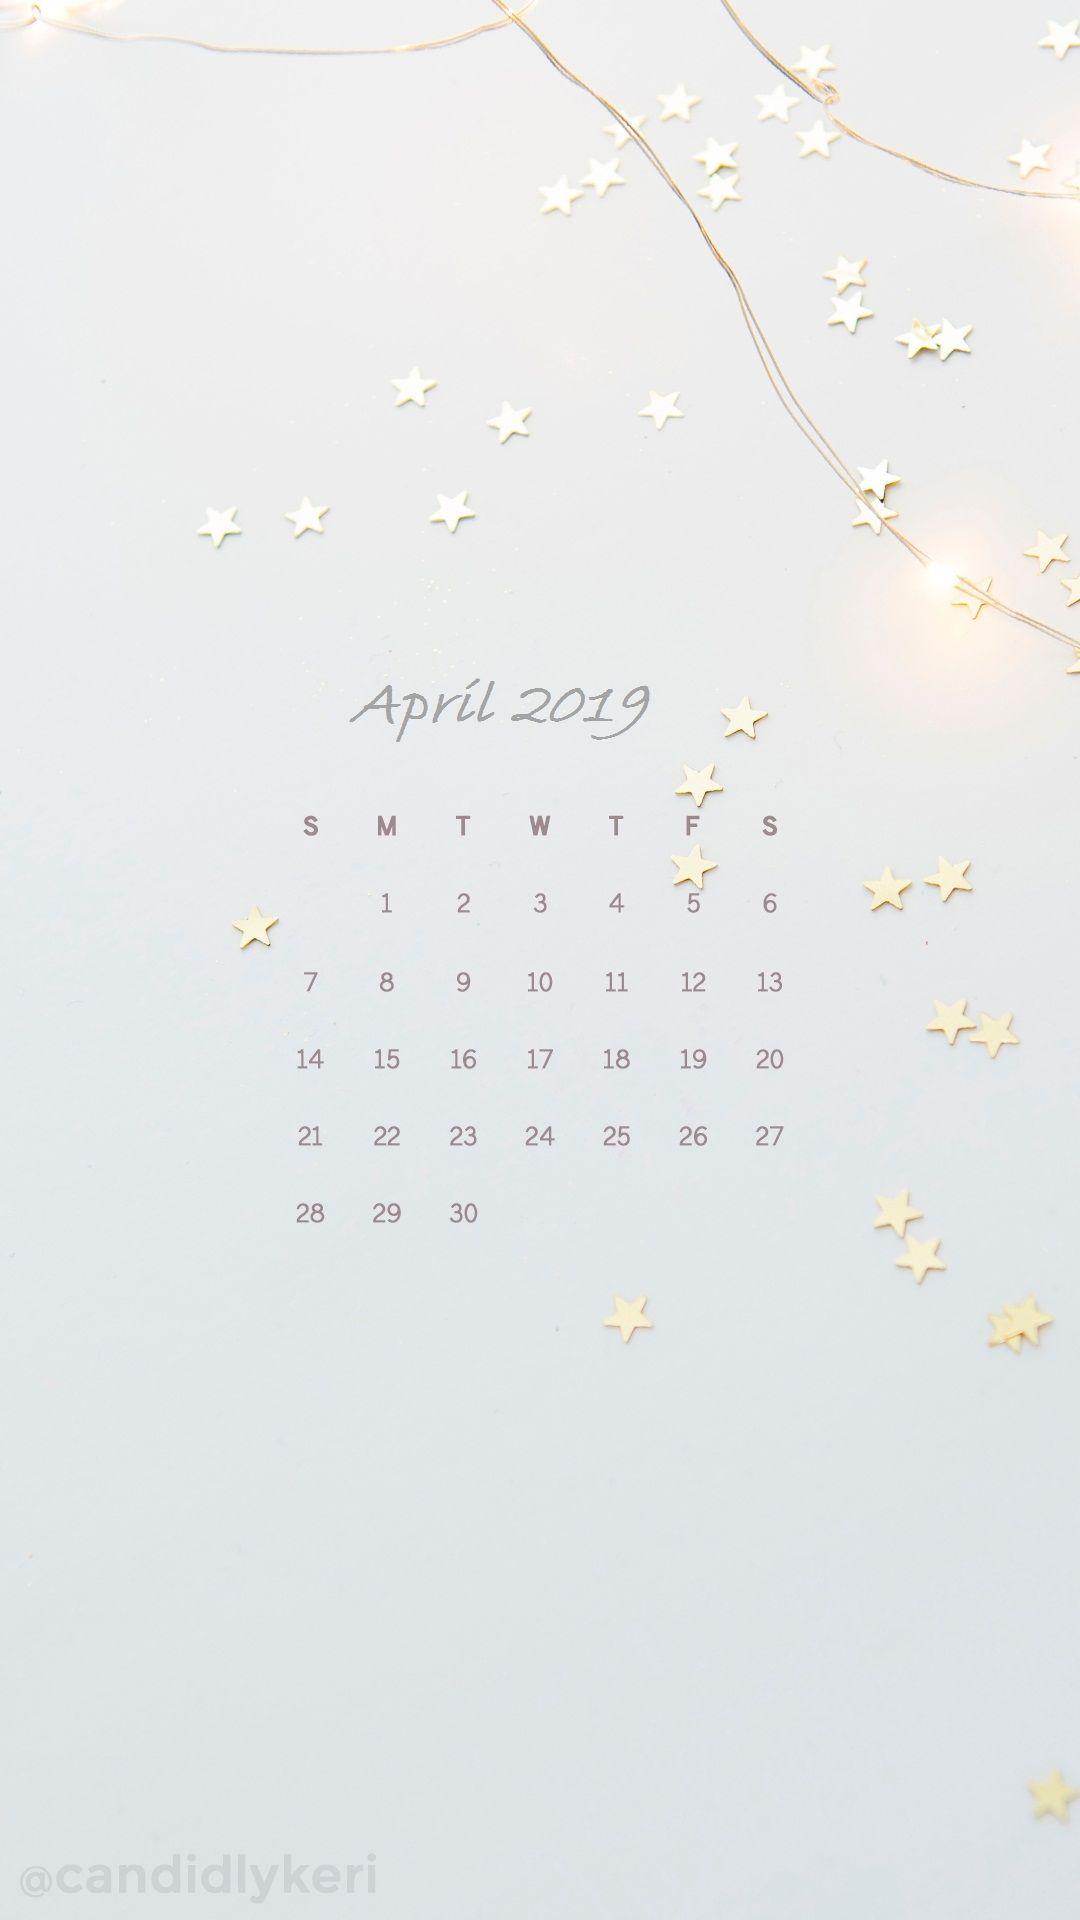 April Iphone Calendar Wallpaper Calendar April